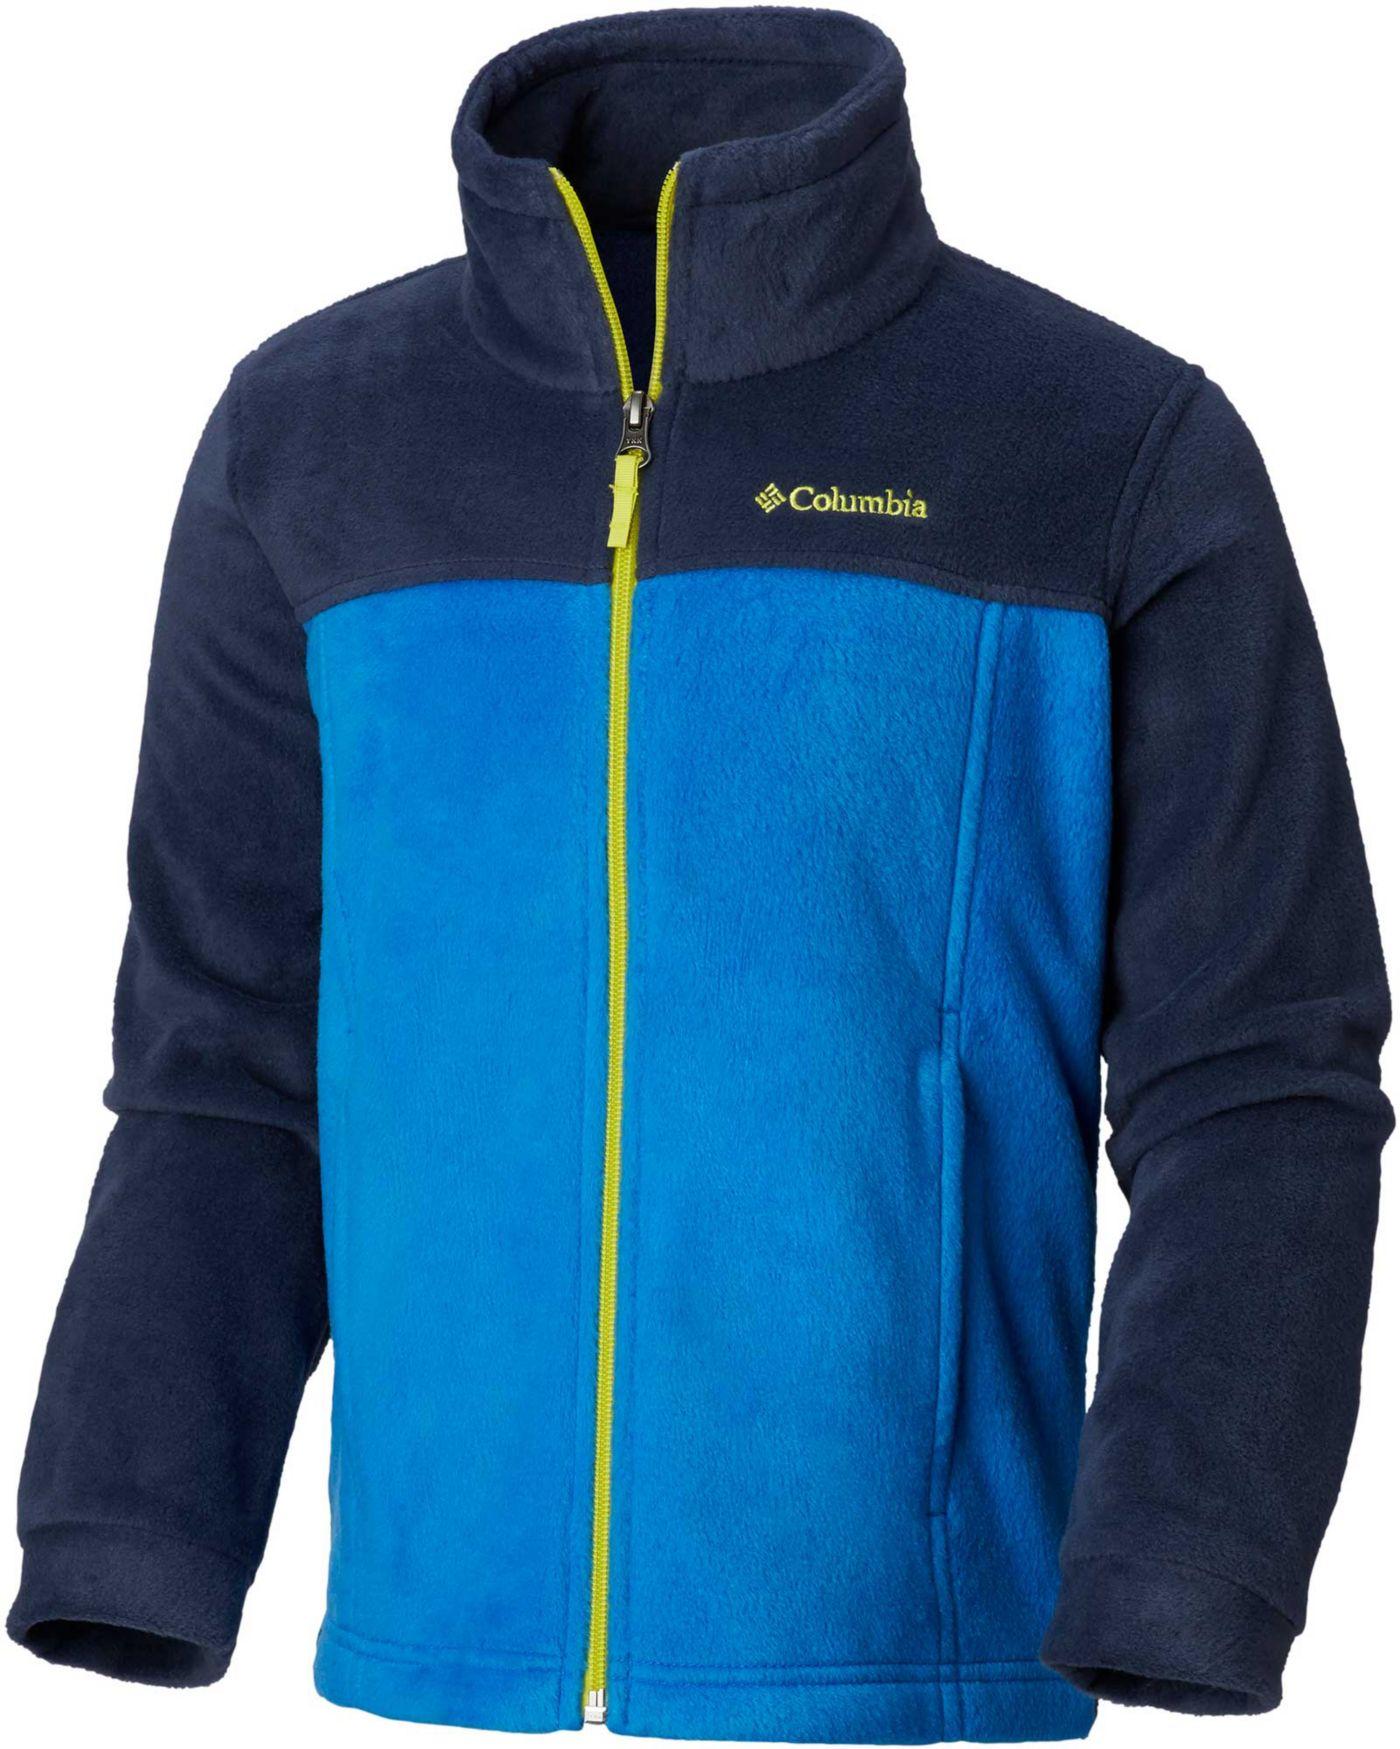 Columbia Boys' Toddler Steens MT II Fleece Jacket